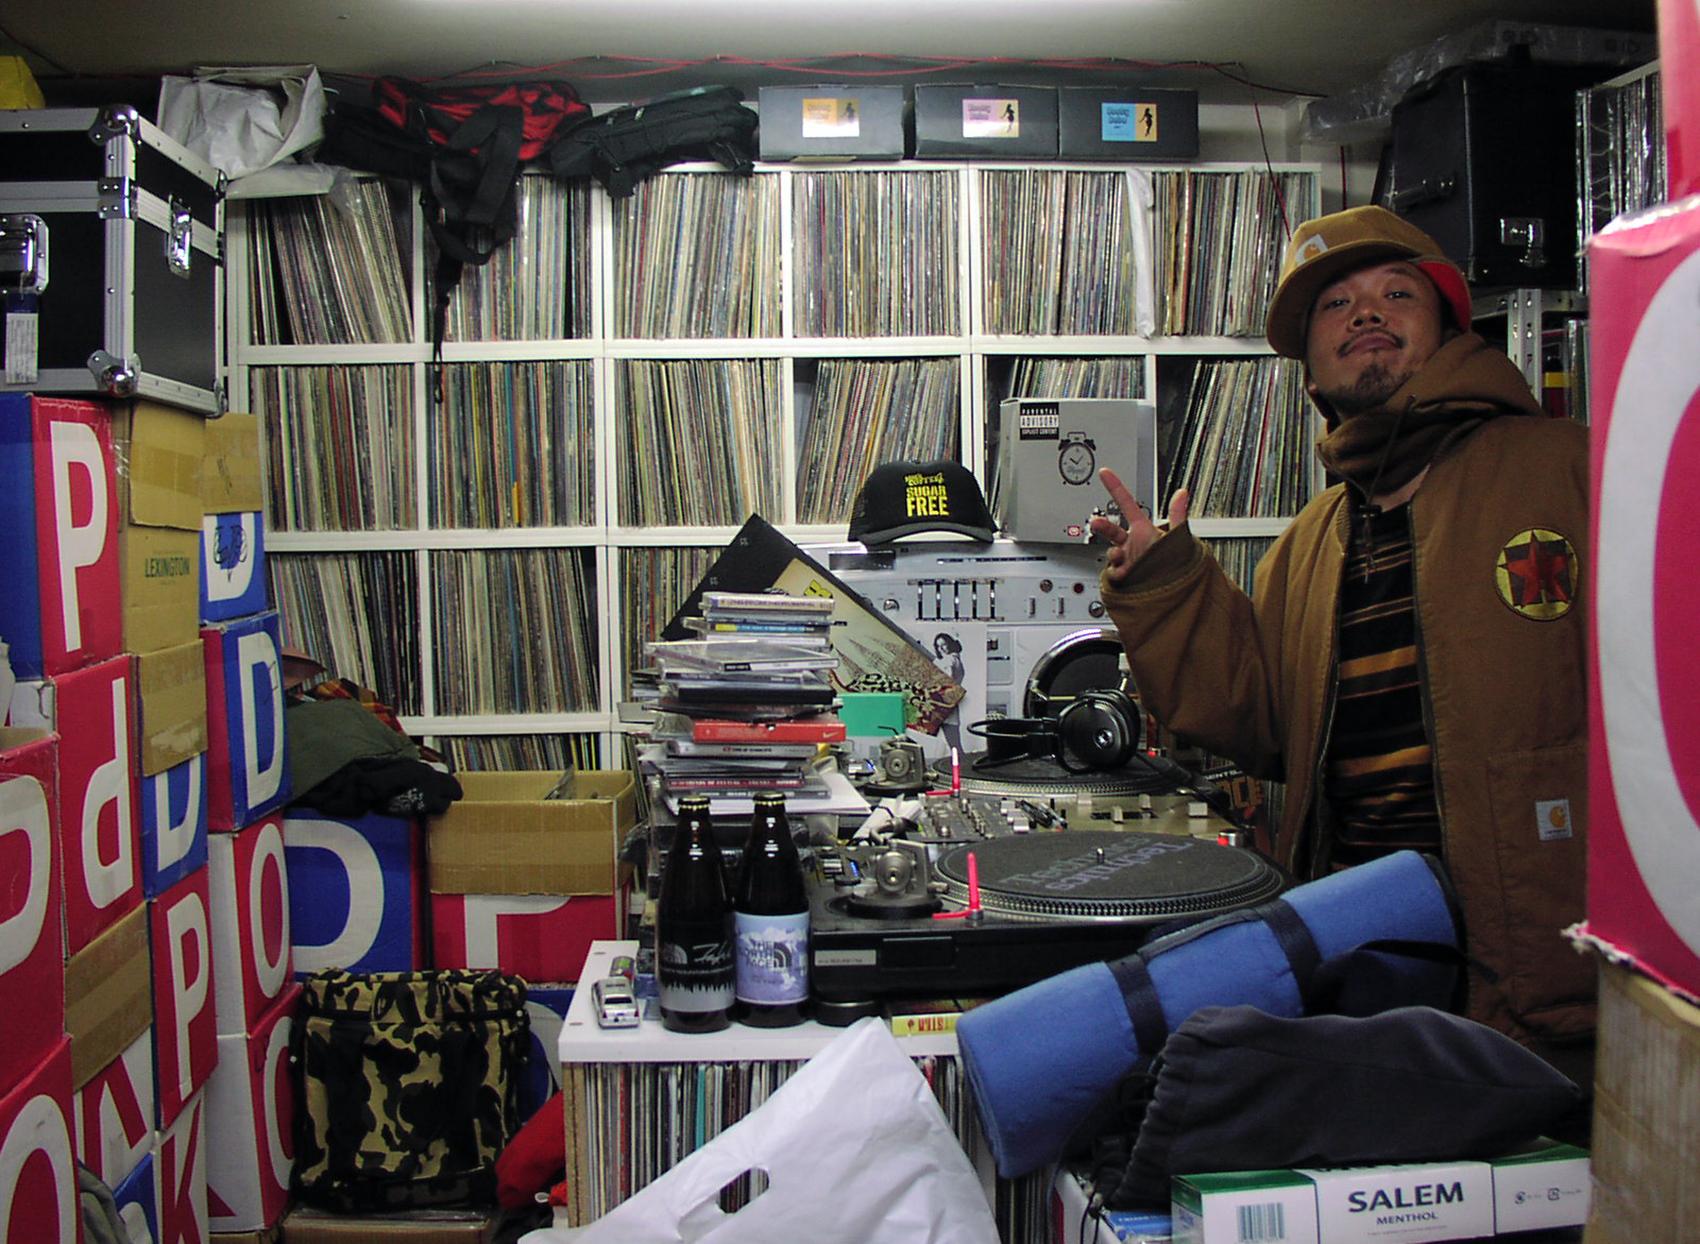 DJ Muro. Photo by James O'Connor.